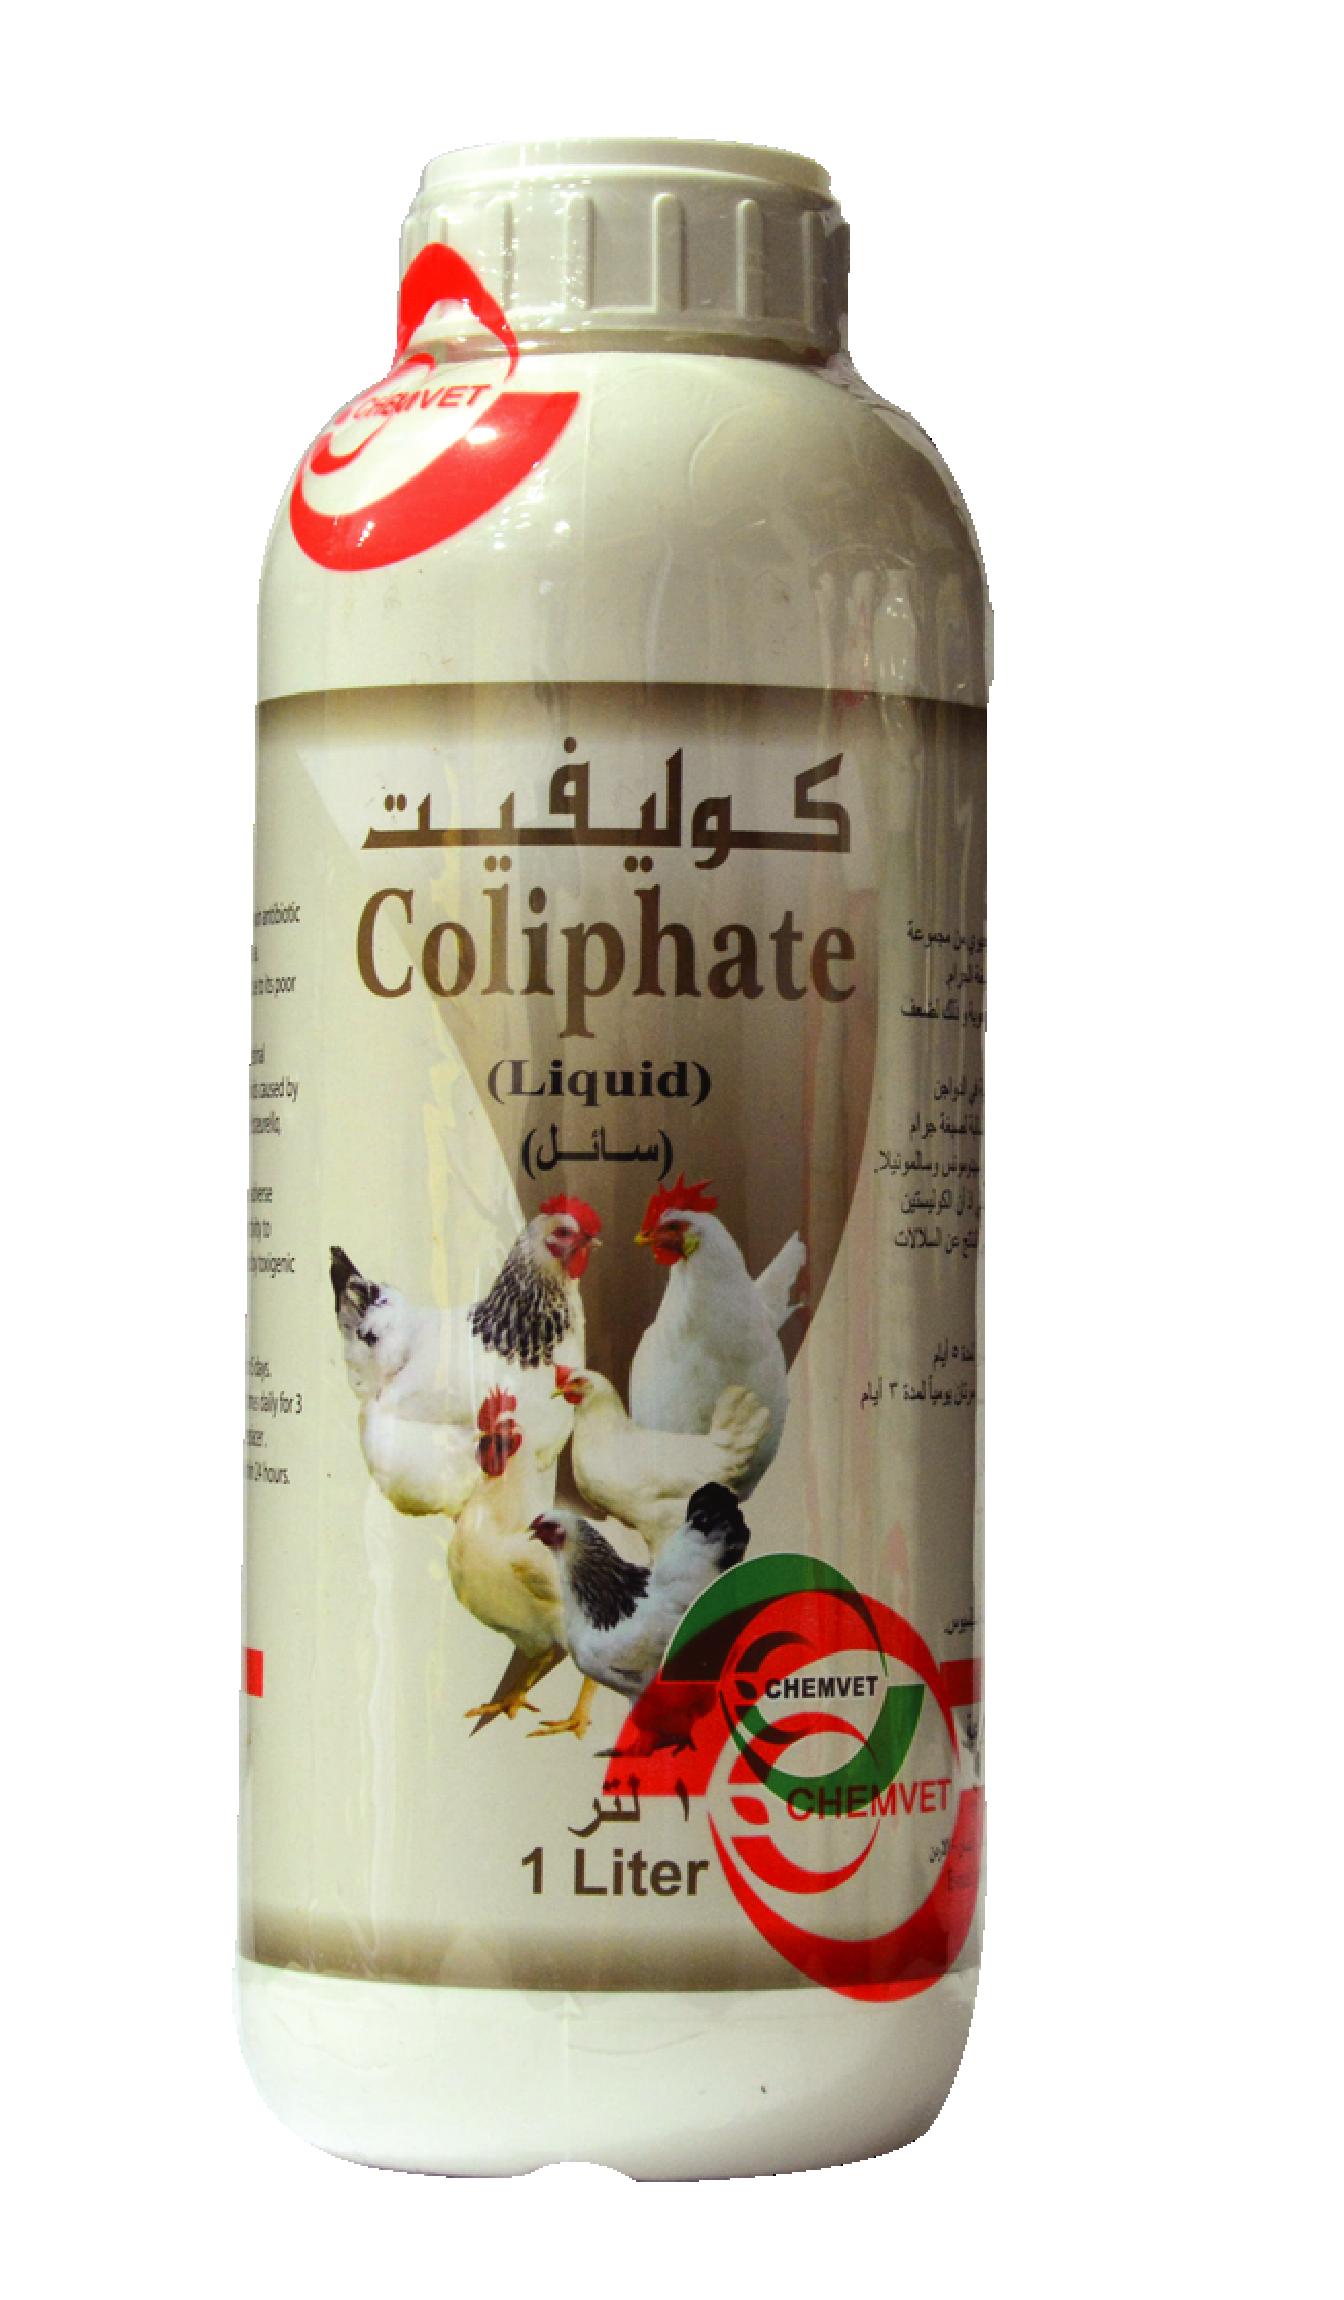 Coliphate (Oral Liquid)